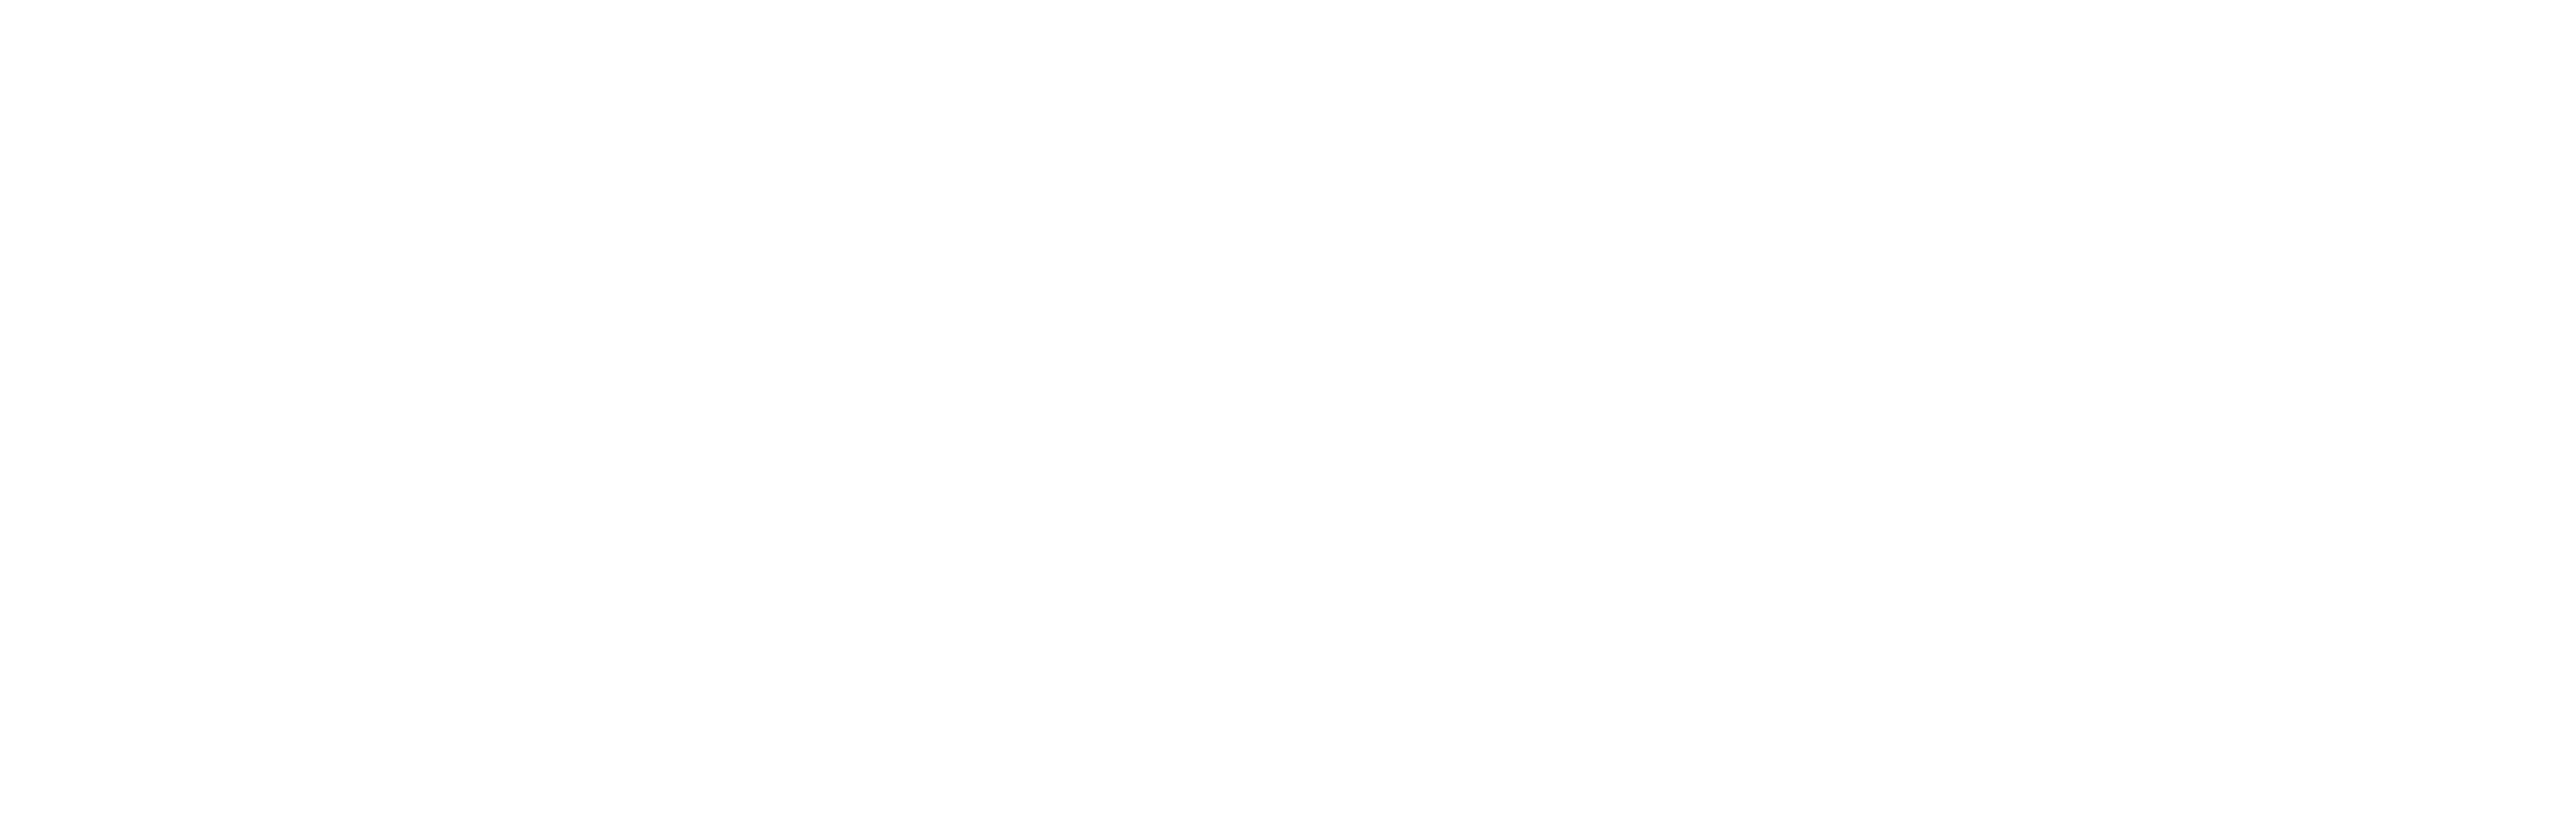 Ilvy Njiokiktjien | Photojournalist and storyteller